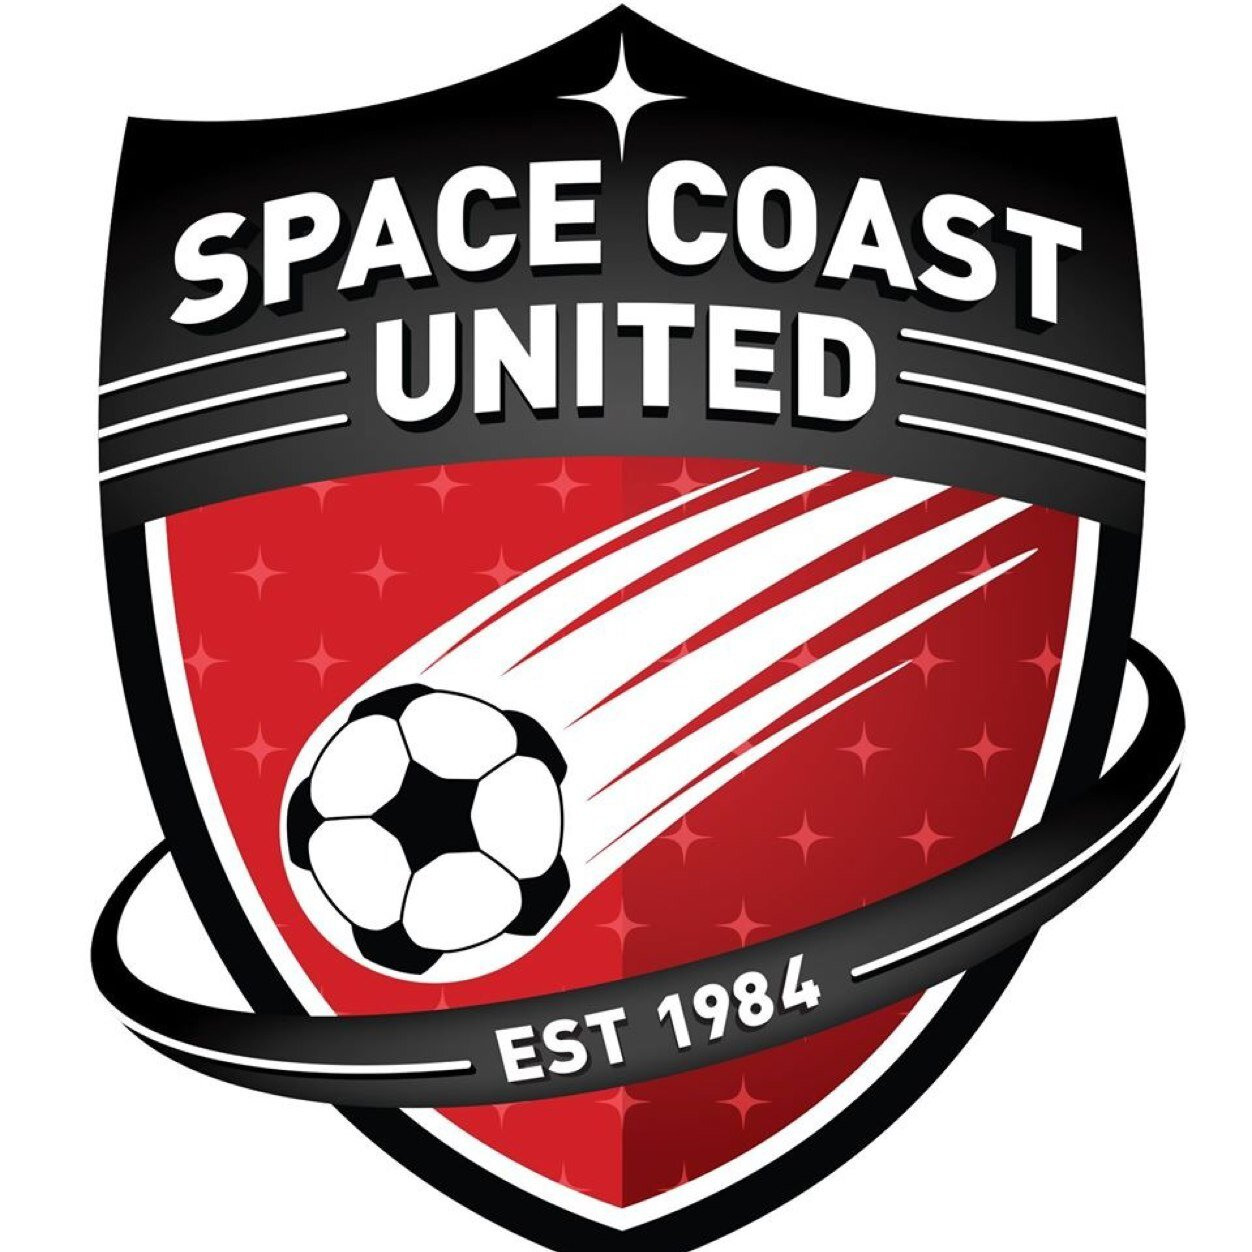 Space Coast United